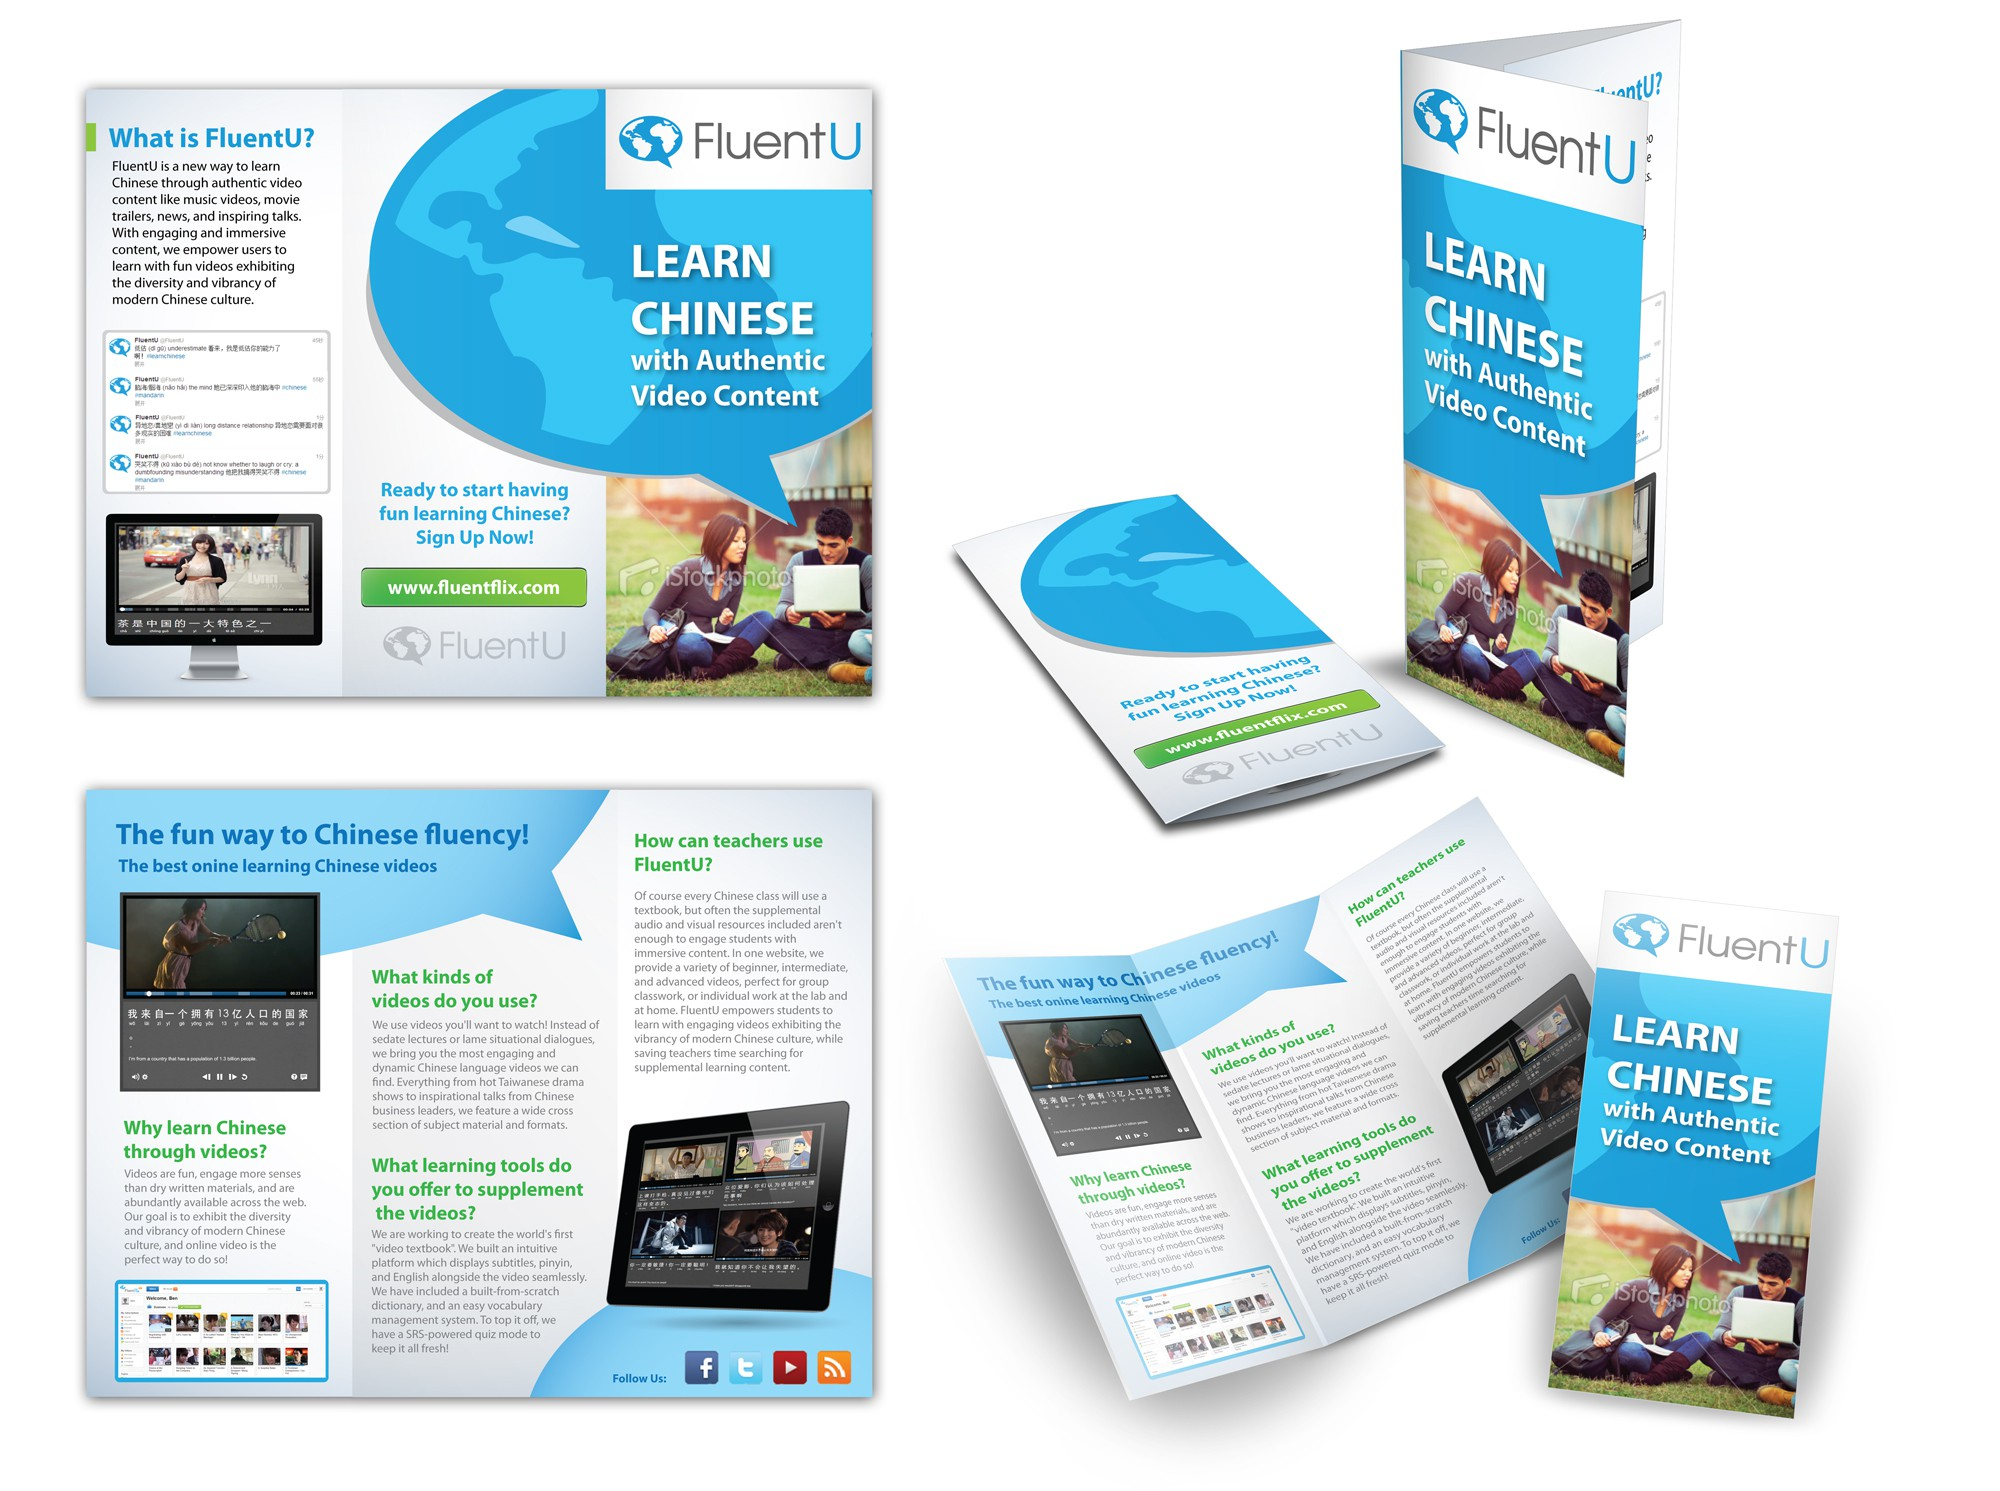 Help FluentU with a new brochure design